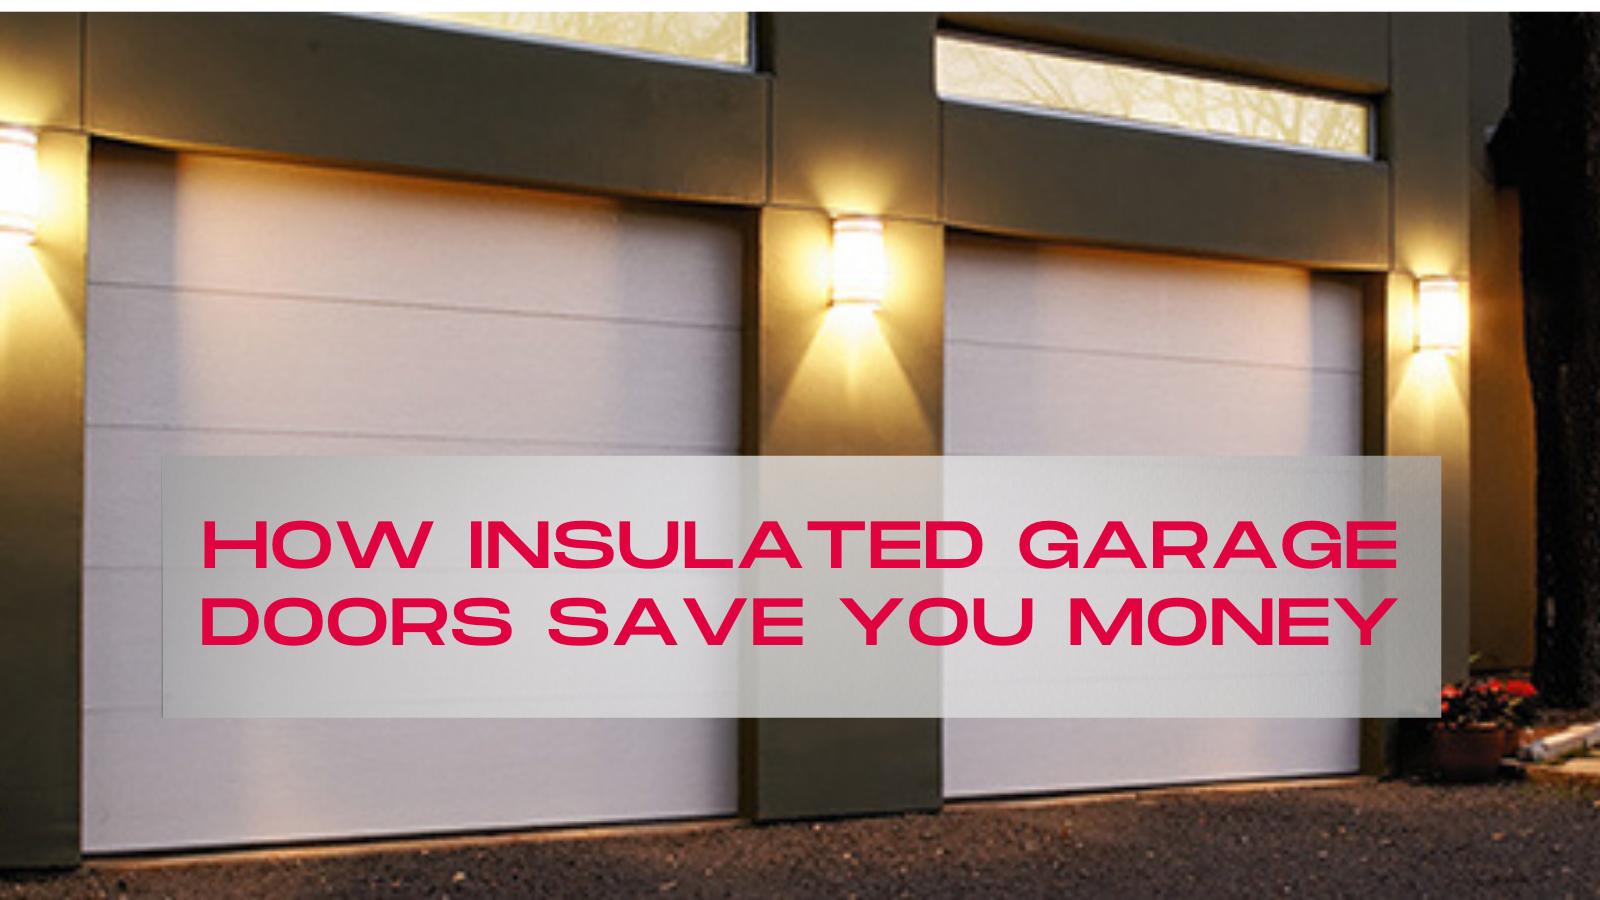 How Insulated Garage Doors Save You Money